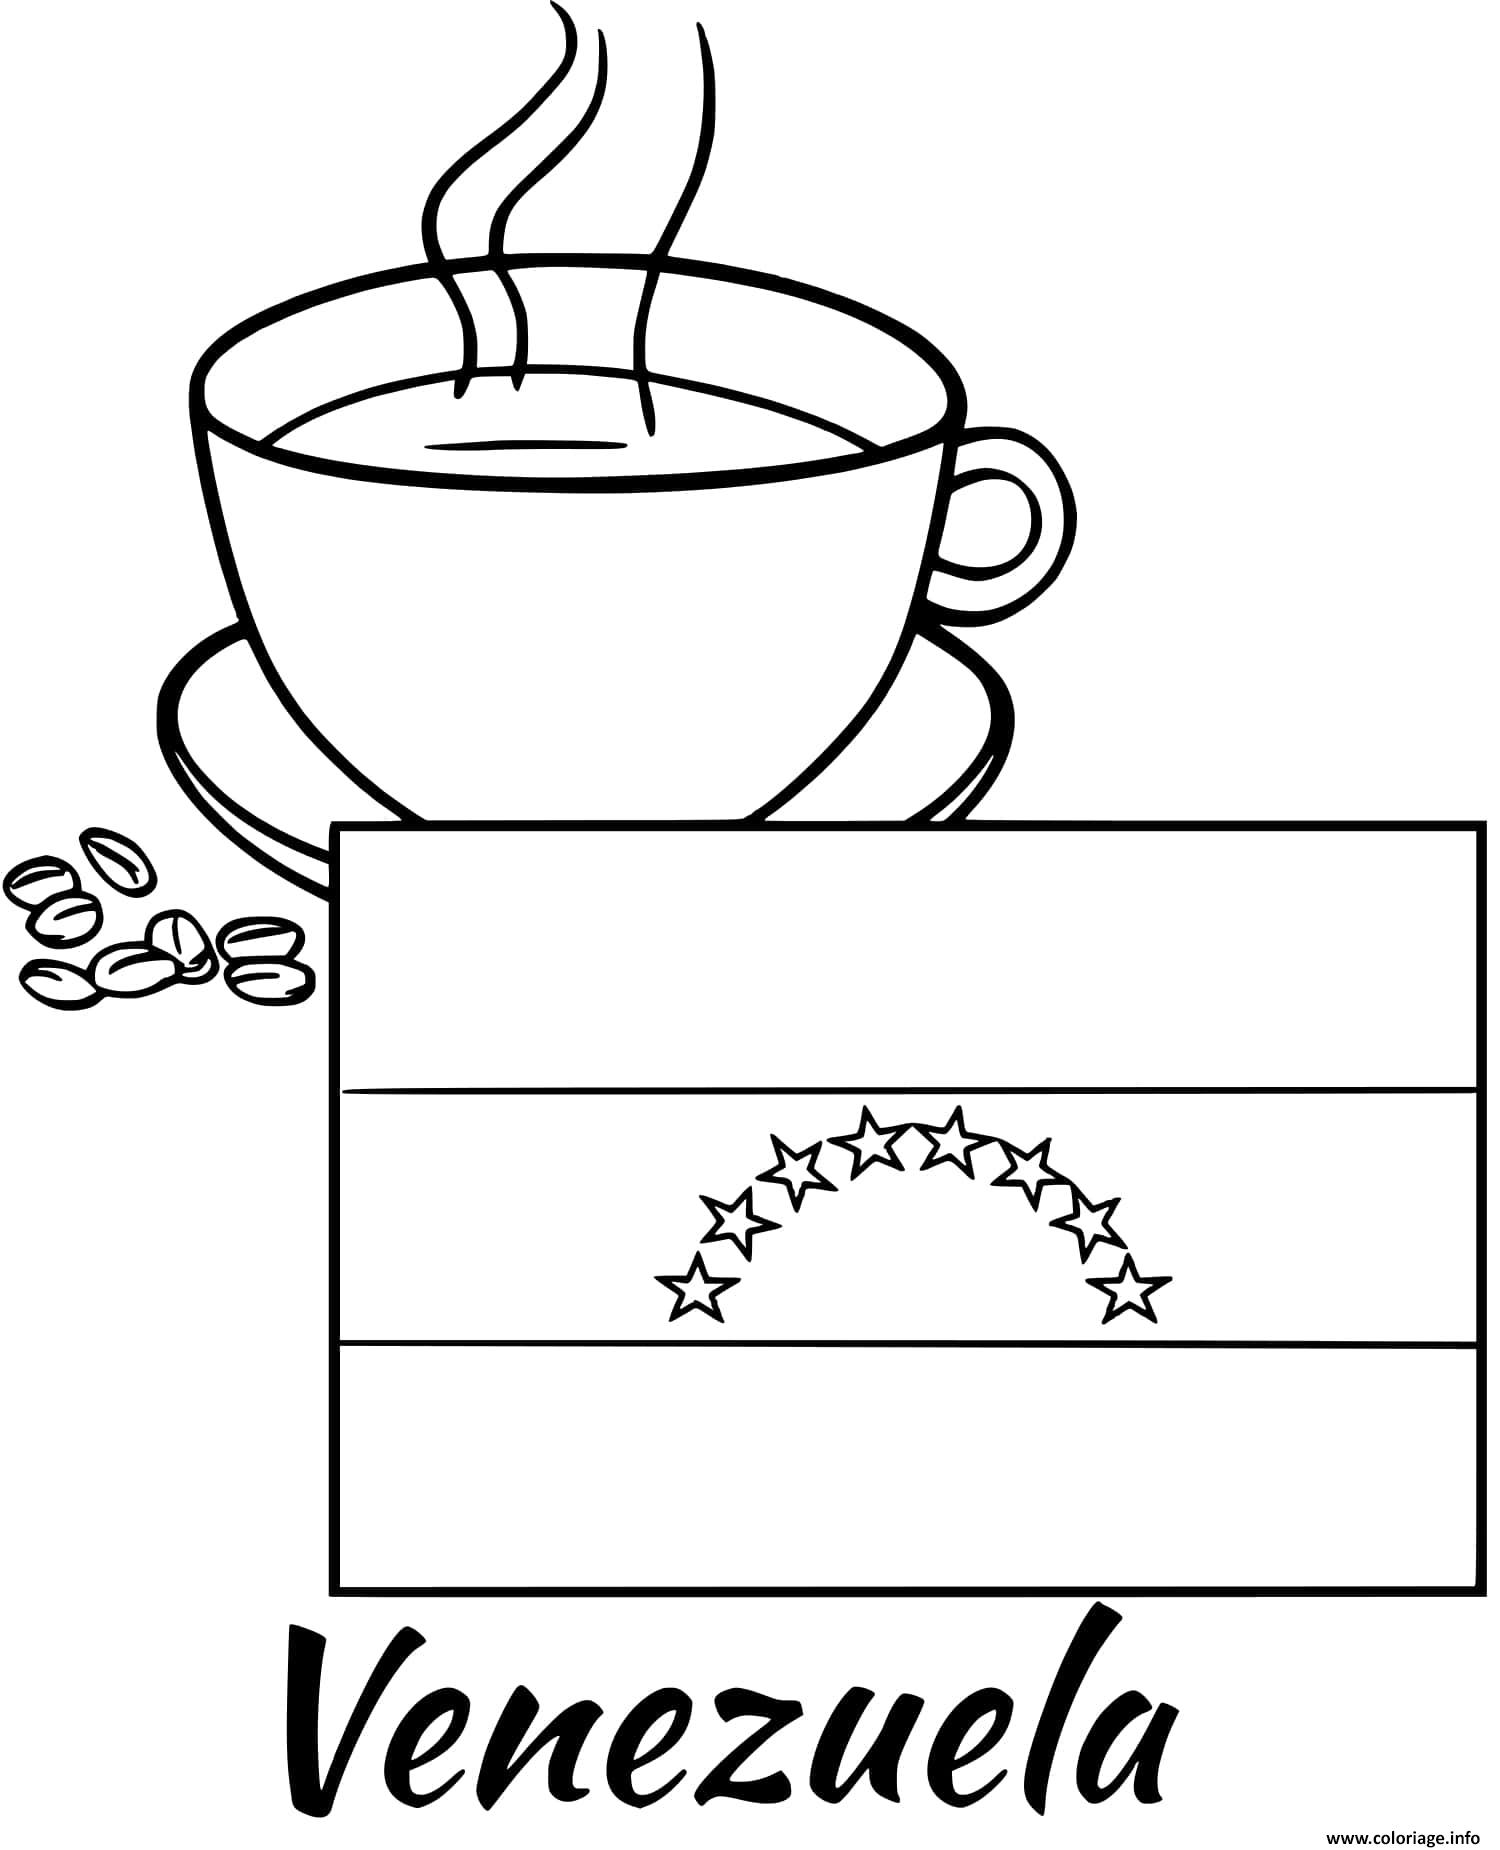 Dessin venezuela drapeau coffee Coloriage Gratuit à Imprimer